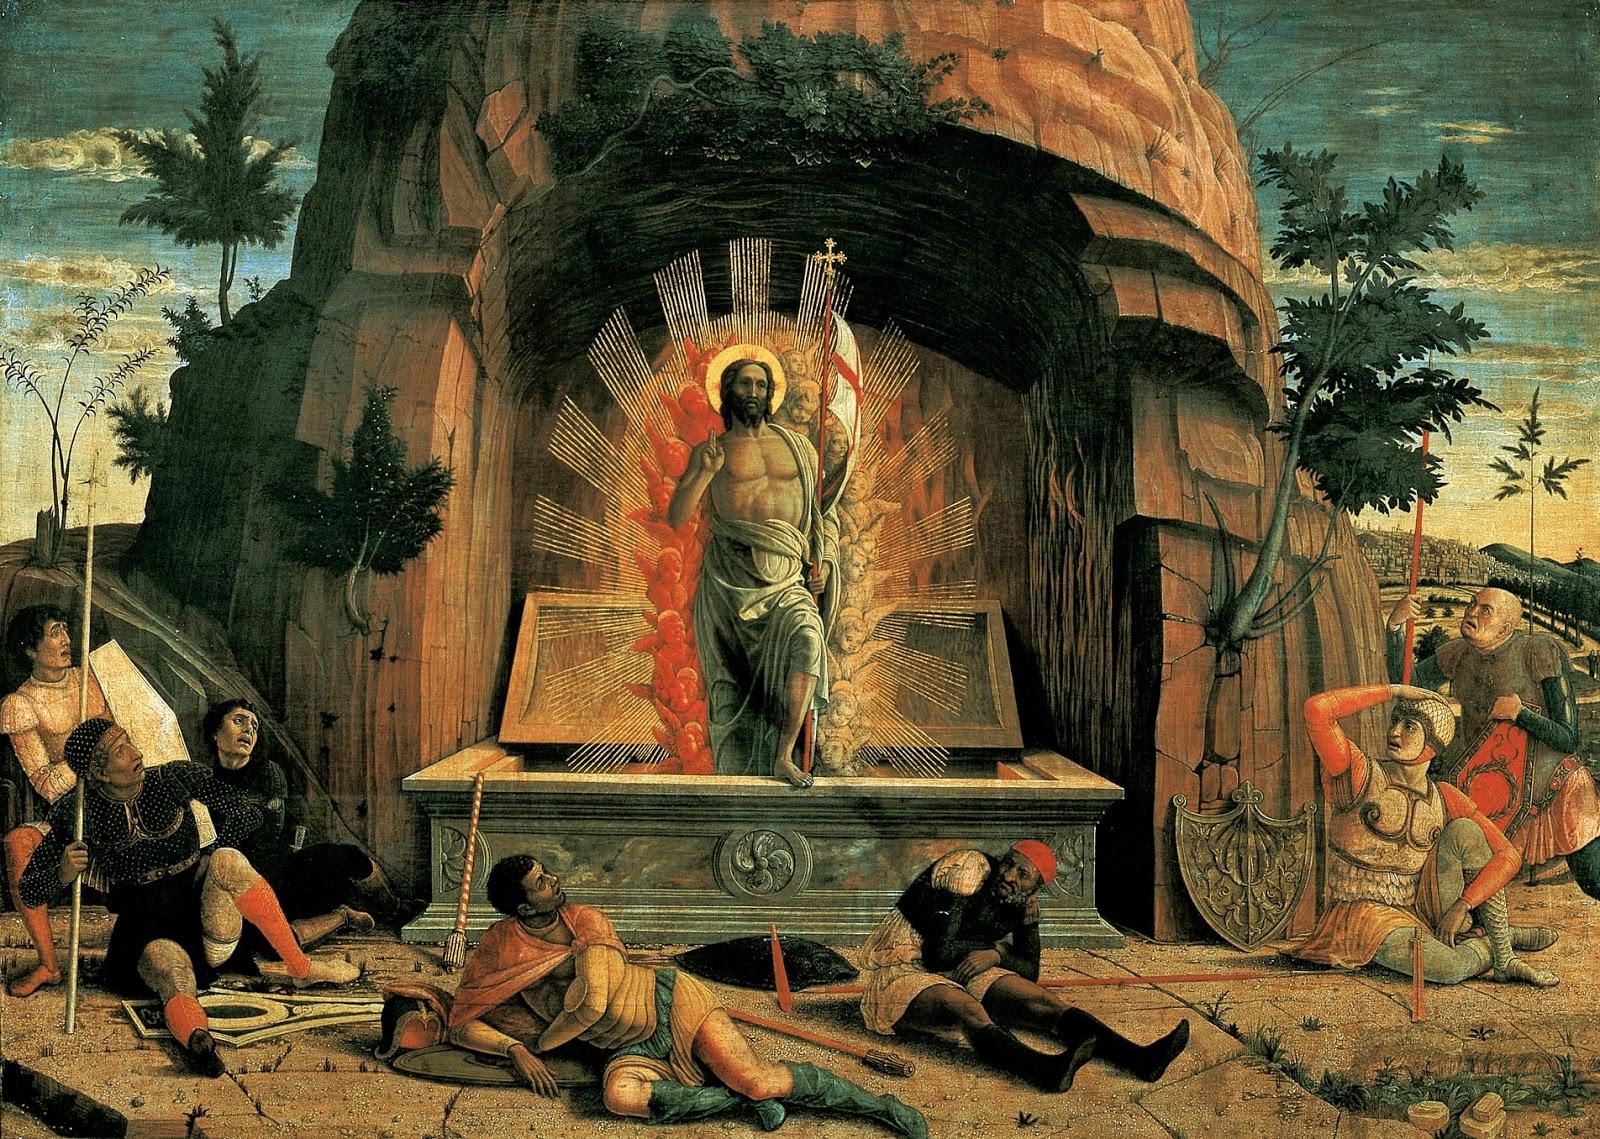 Andrea Mantegna-The Resurrection (1457-1459)